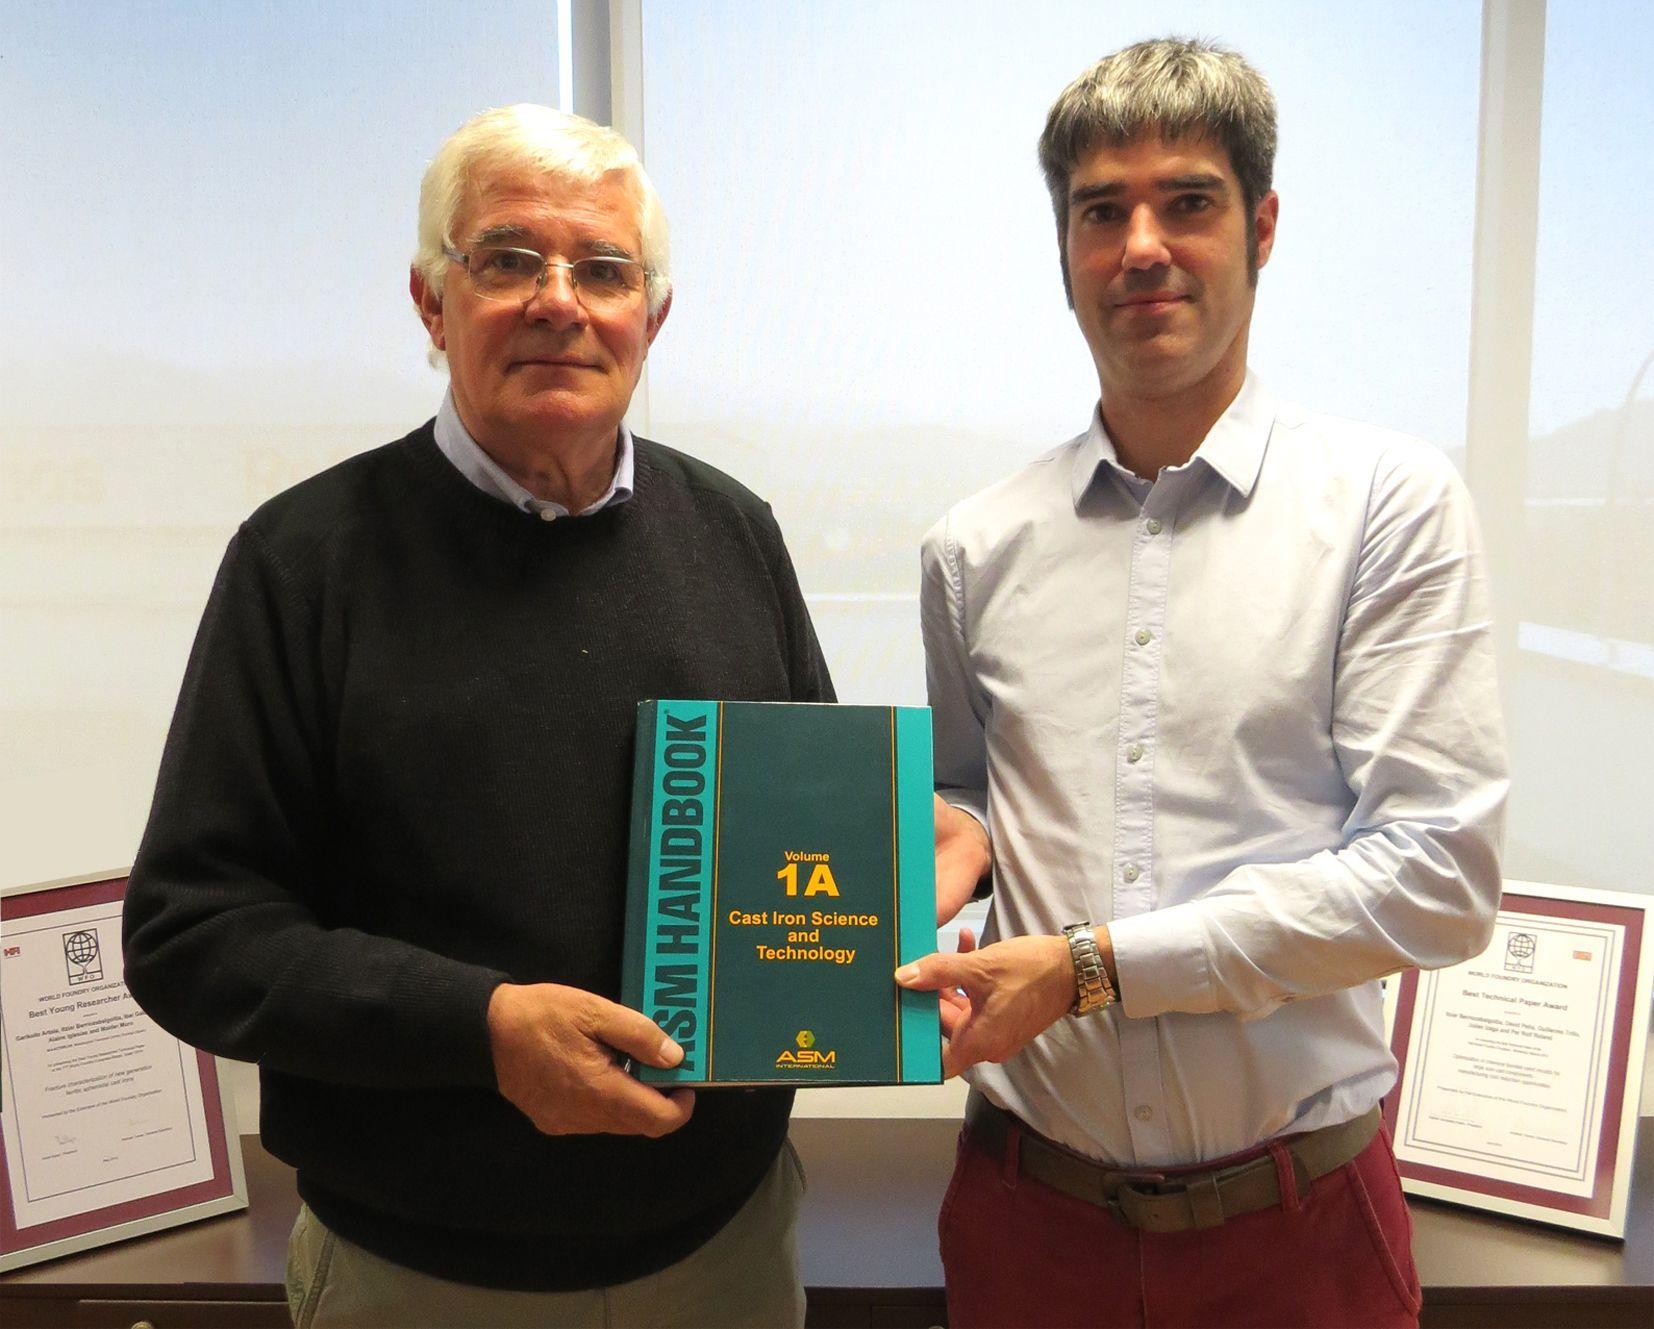 Ik4-Azterlan ASM handbook